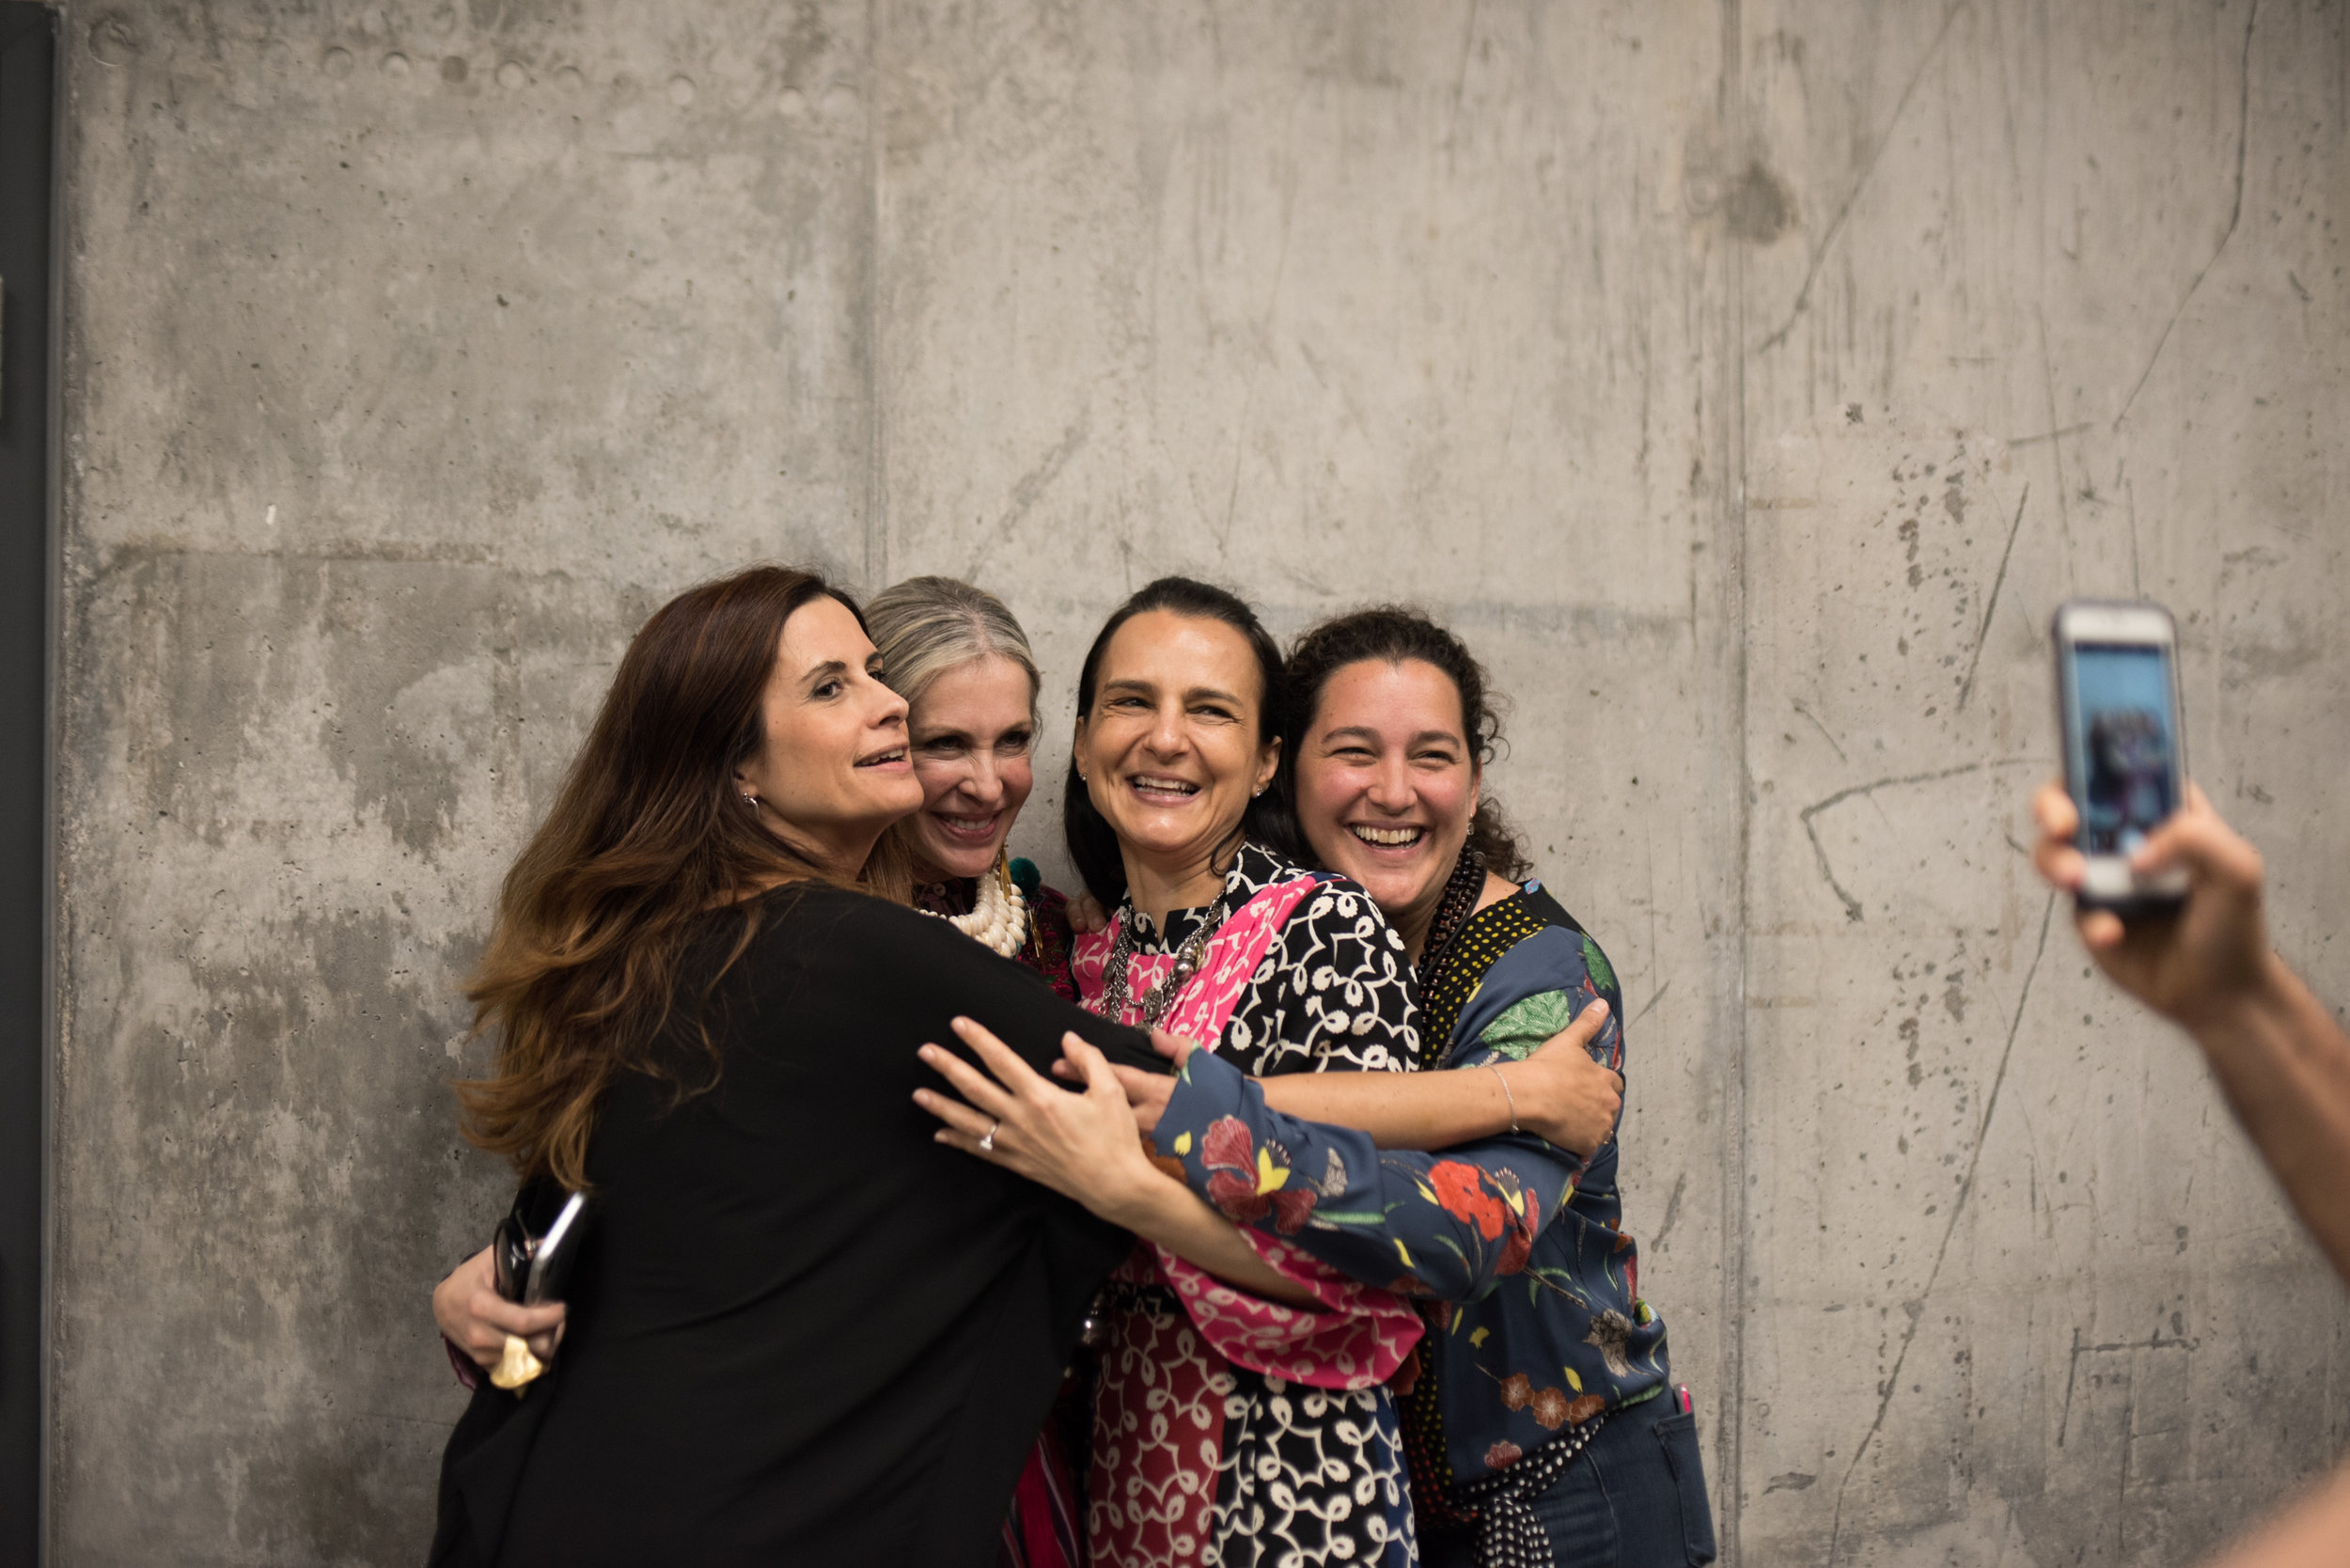 Livia Firth, Carmen, Marianne Hernandez, and Celina de Sola / Photo: Mauricio Martinez